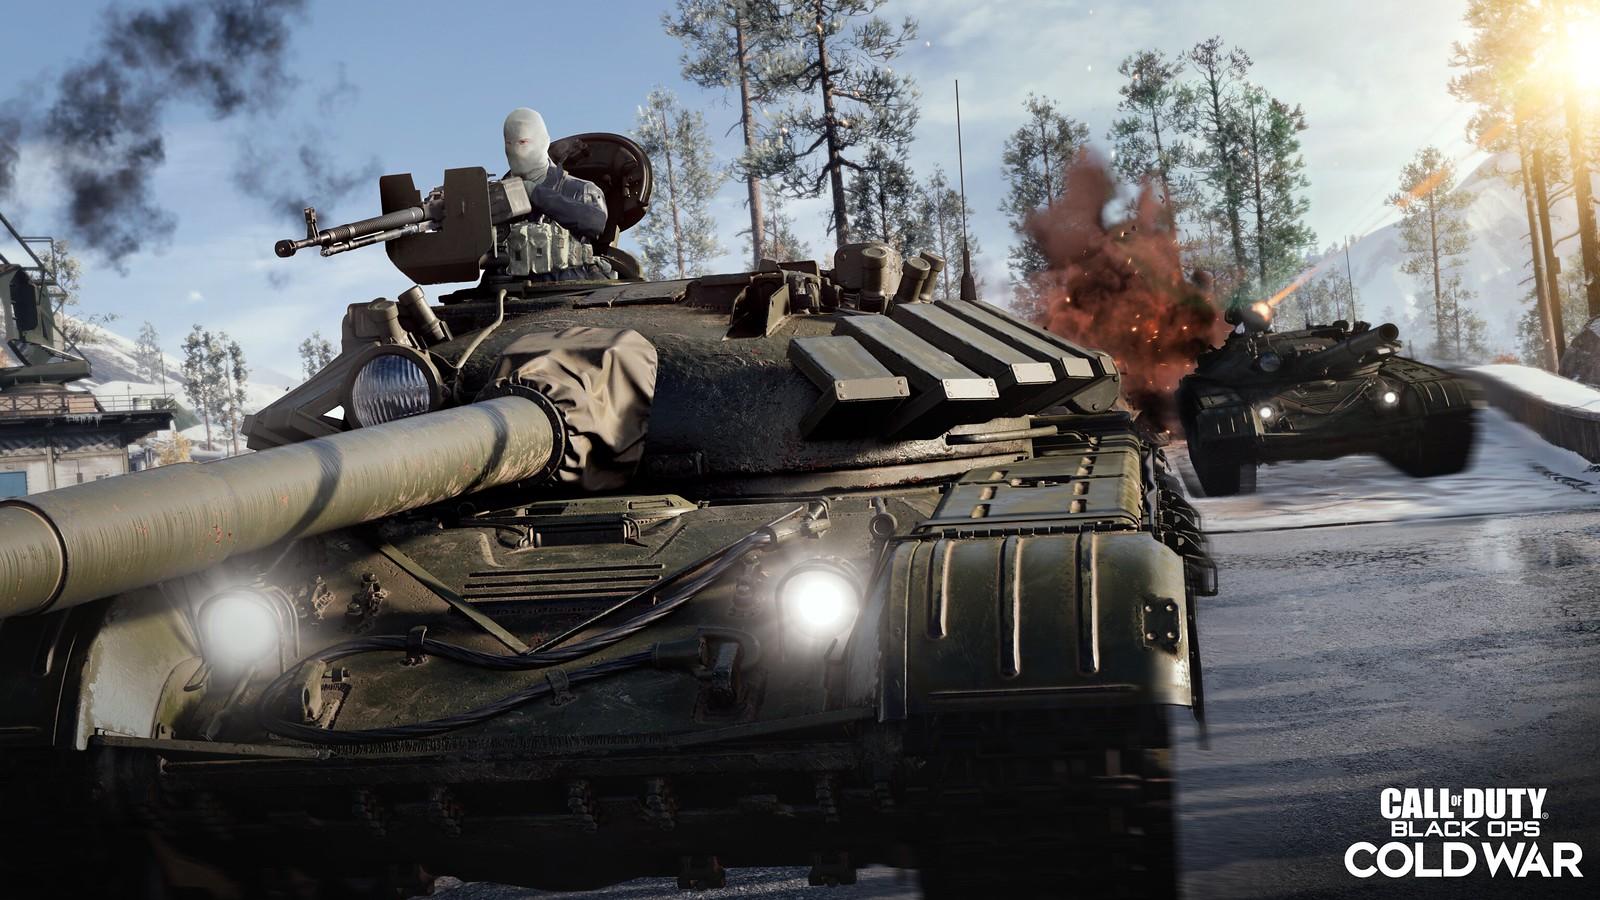 Dojmy z hraní - Call of Duty: Black Ops Cold War 50351079987 4eec13c488 h